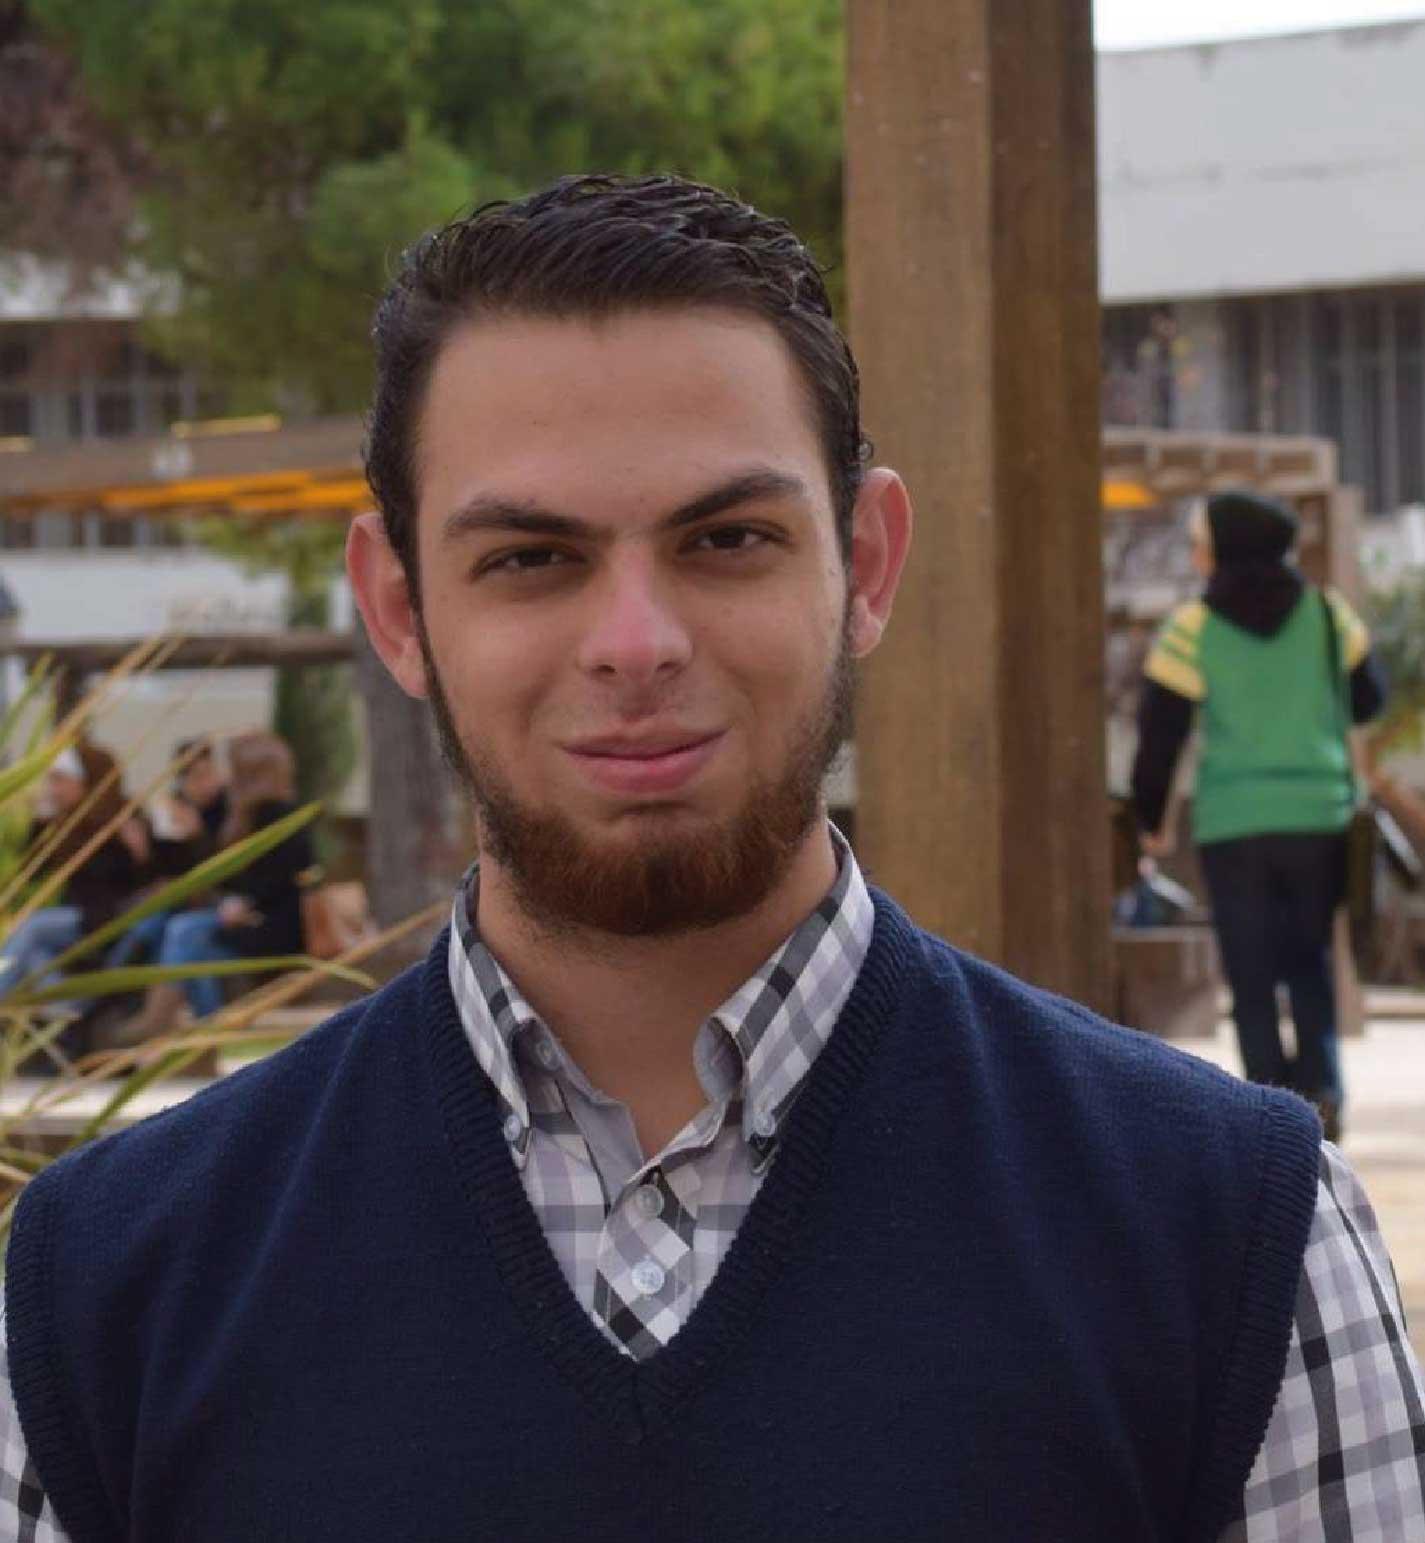 Eng. Mohammed Abu-Taha